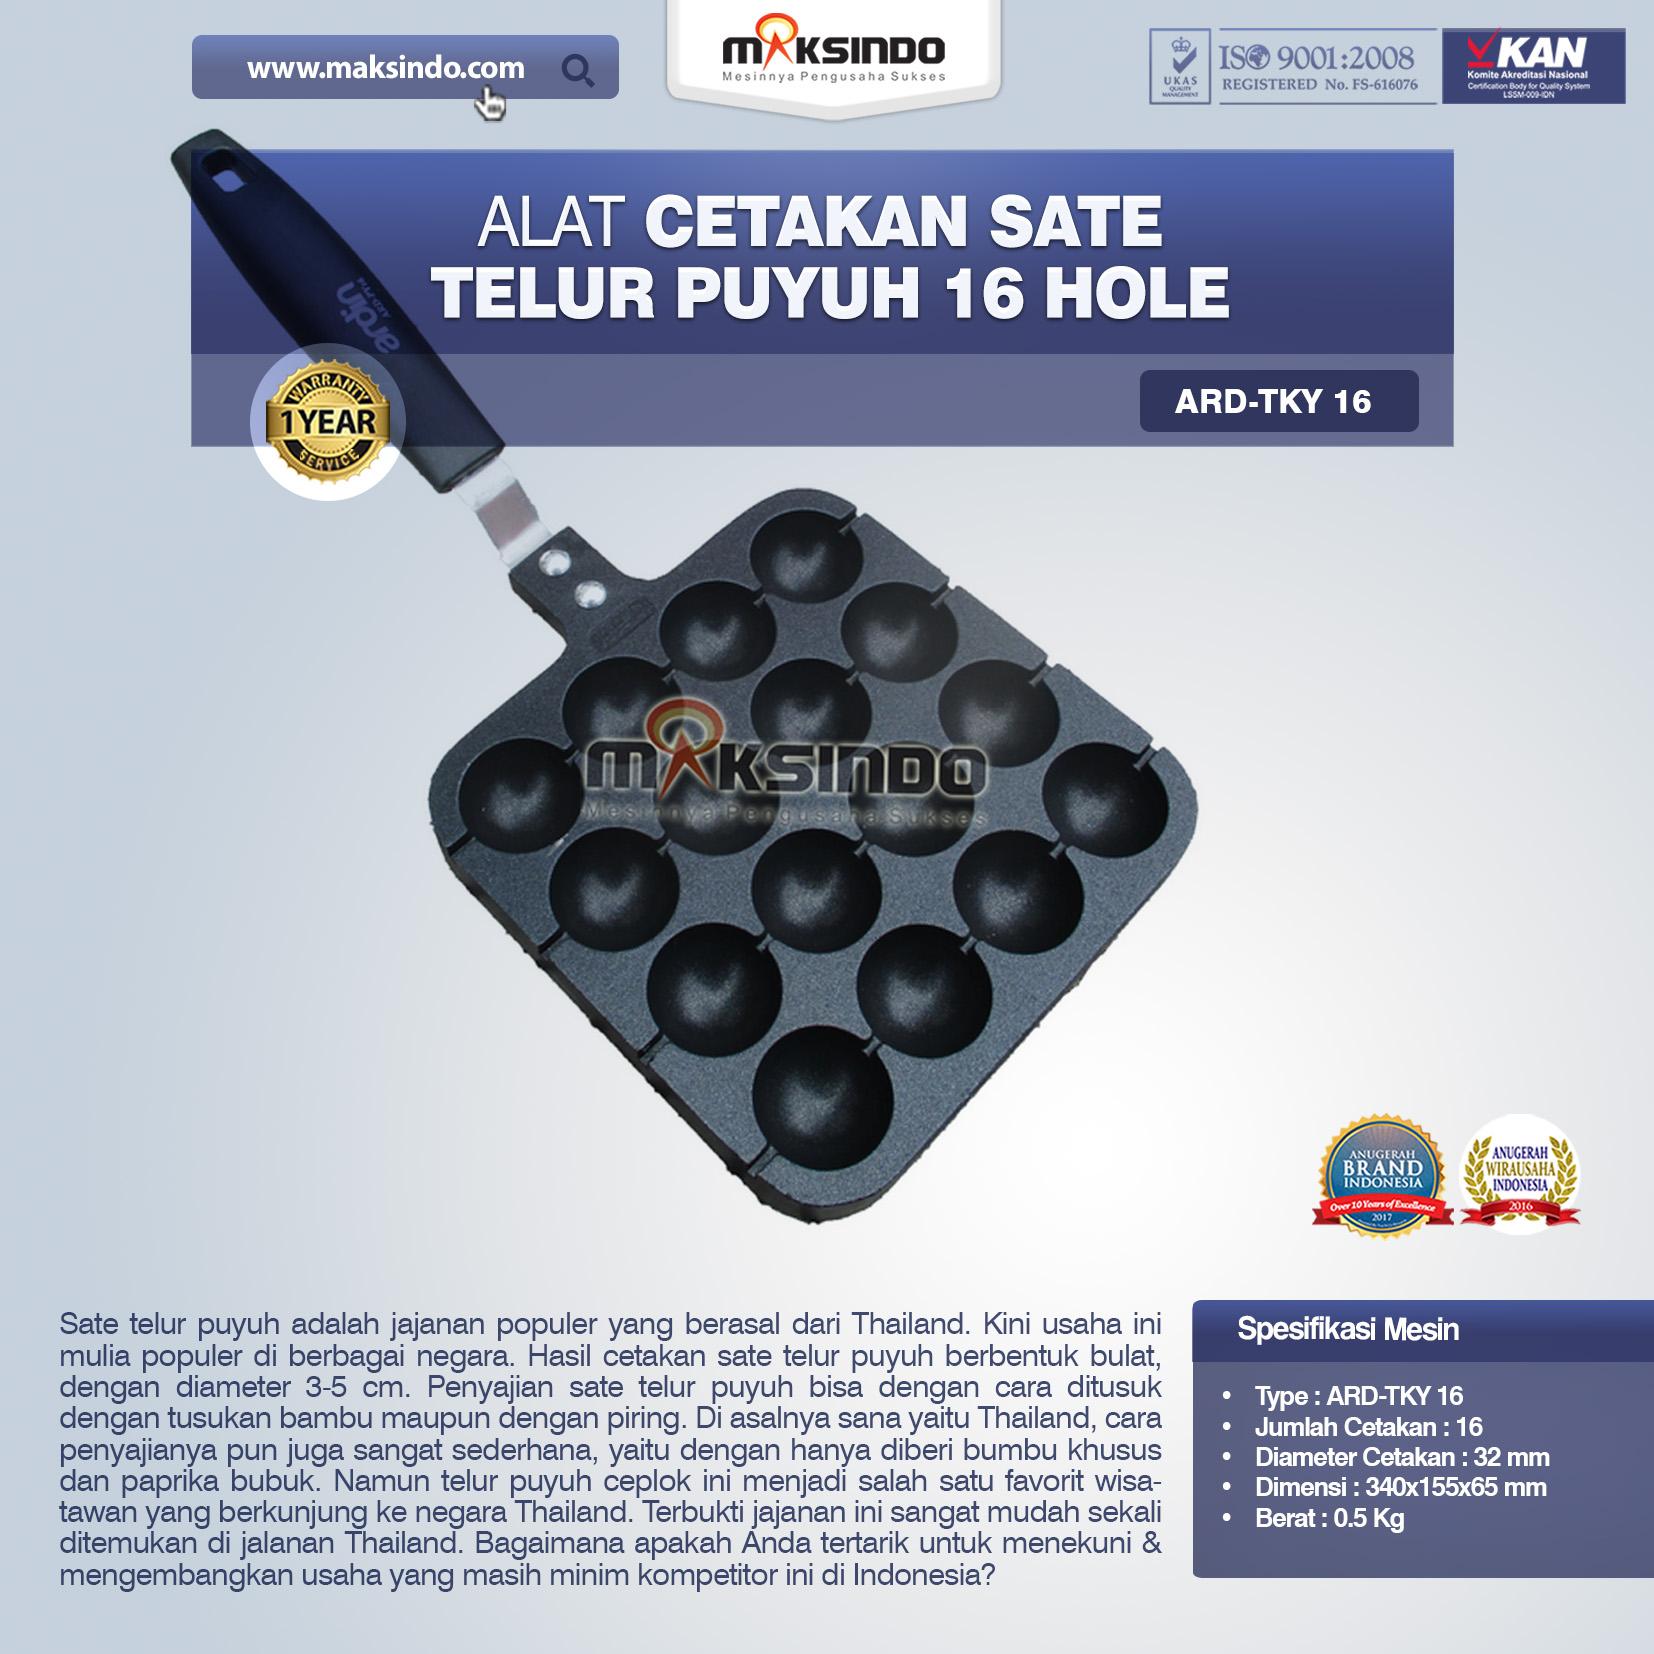 Jual Alat Cetakan Sate Telur Puyuh 16 Hole Ardin TKY16 di Blitar